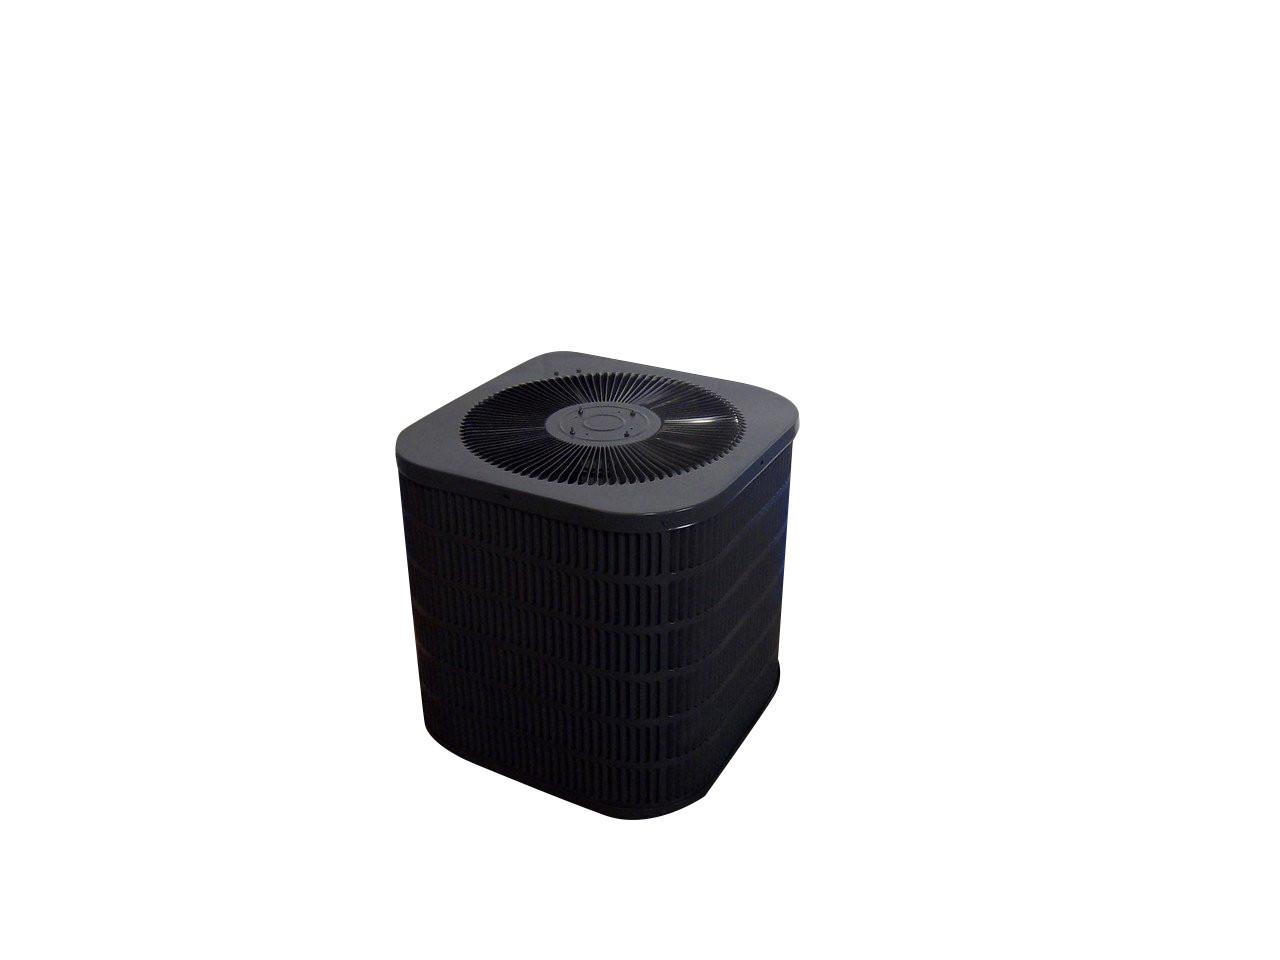 medium resolution of trane condenser fan motor wiring diagram images air conditioner air conditioner condenser best home design and